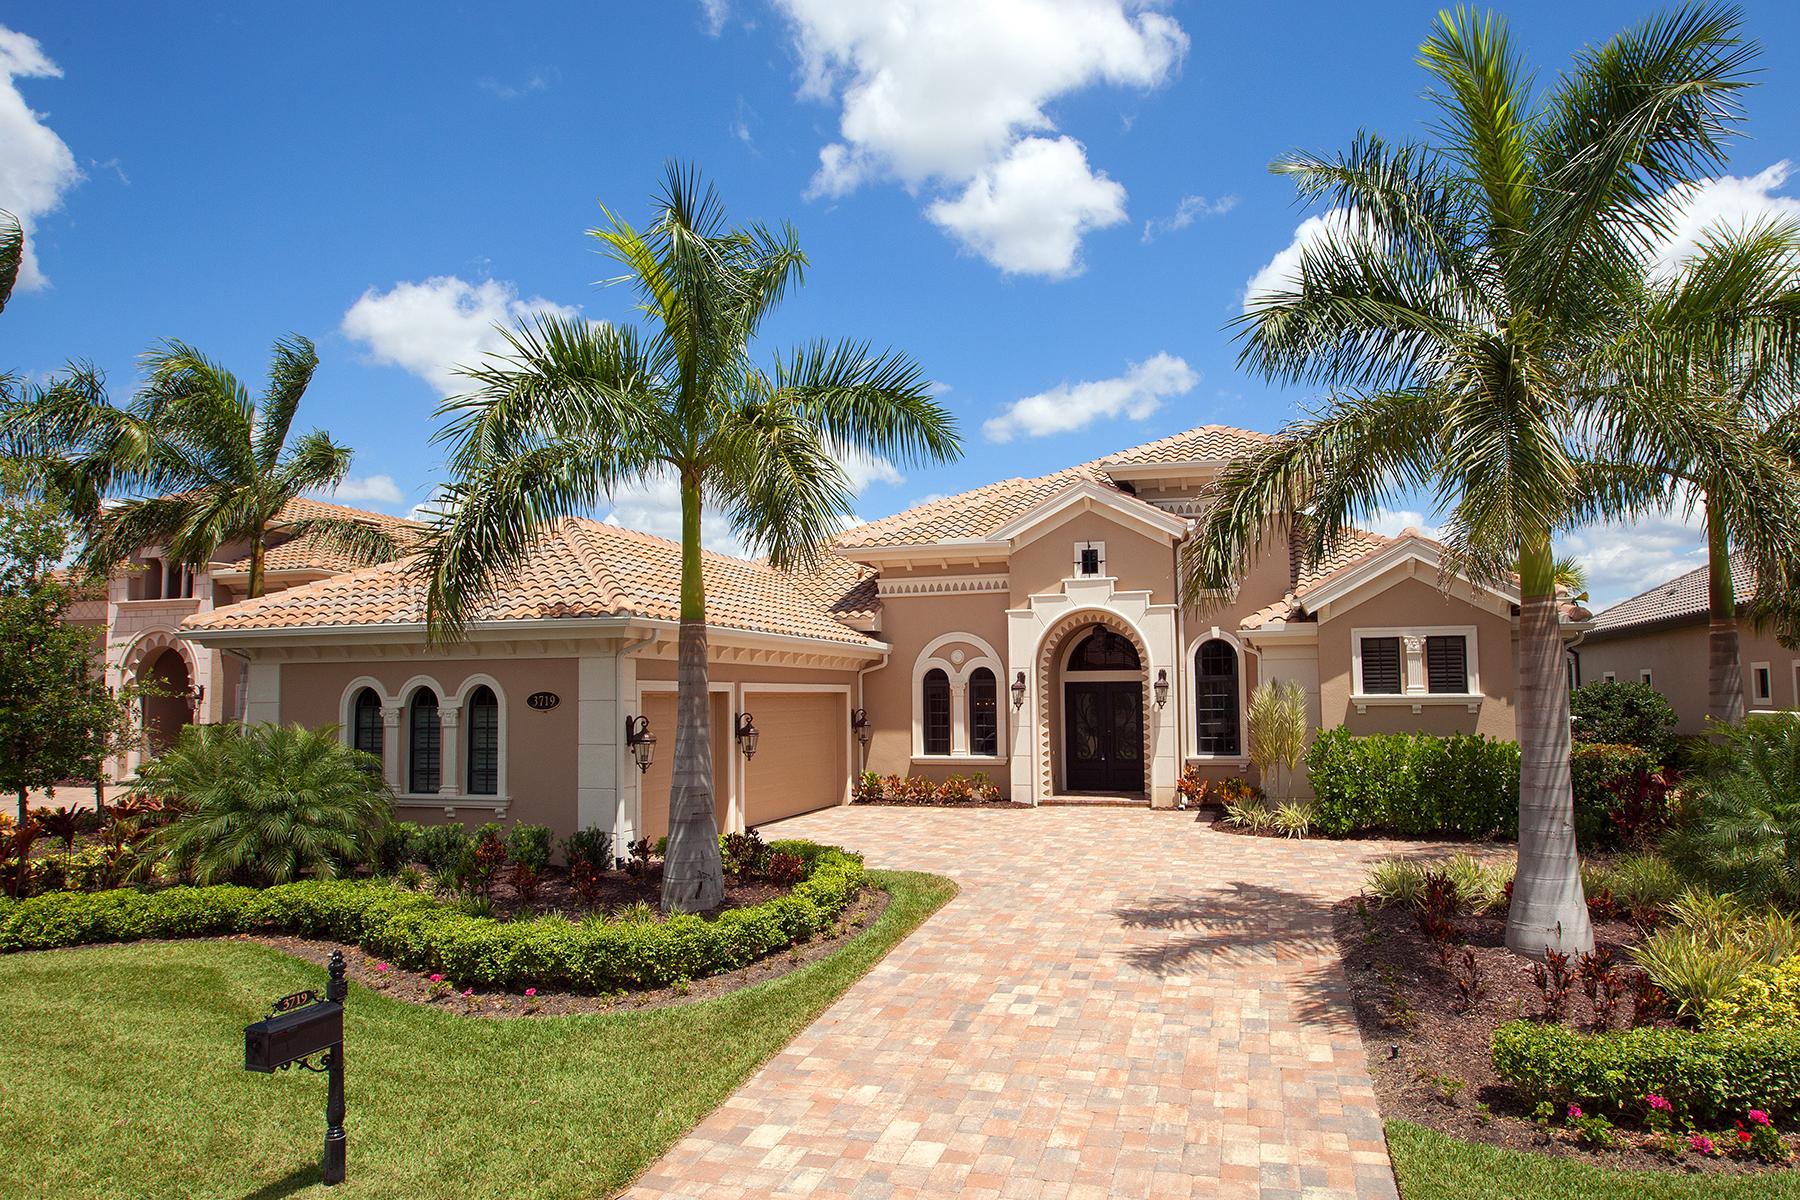 Villa per Vendita alle ore FIDDLERS CREEK - MAHOGANY BEND 3719 Mahogany Bend Dr Naples, Florida, 34114 Stati Uniti